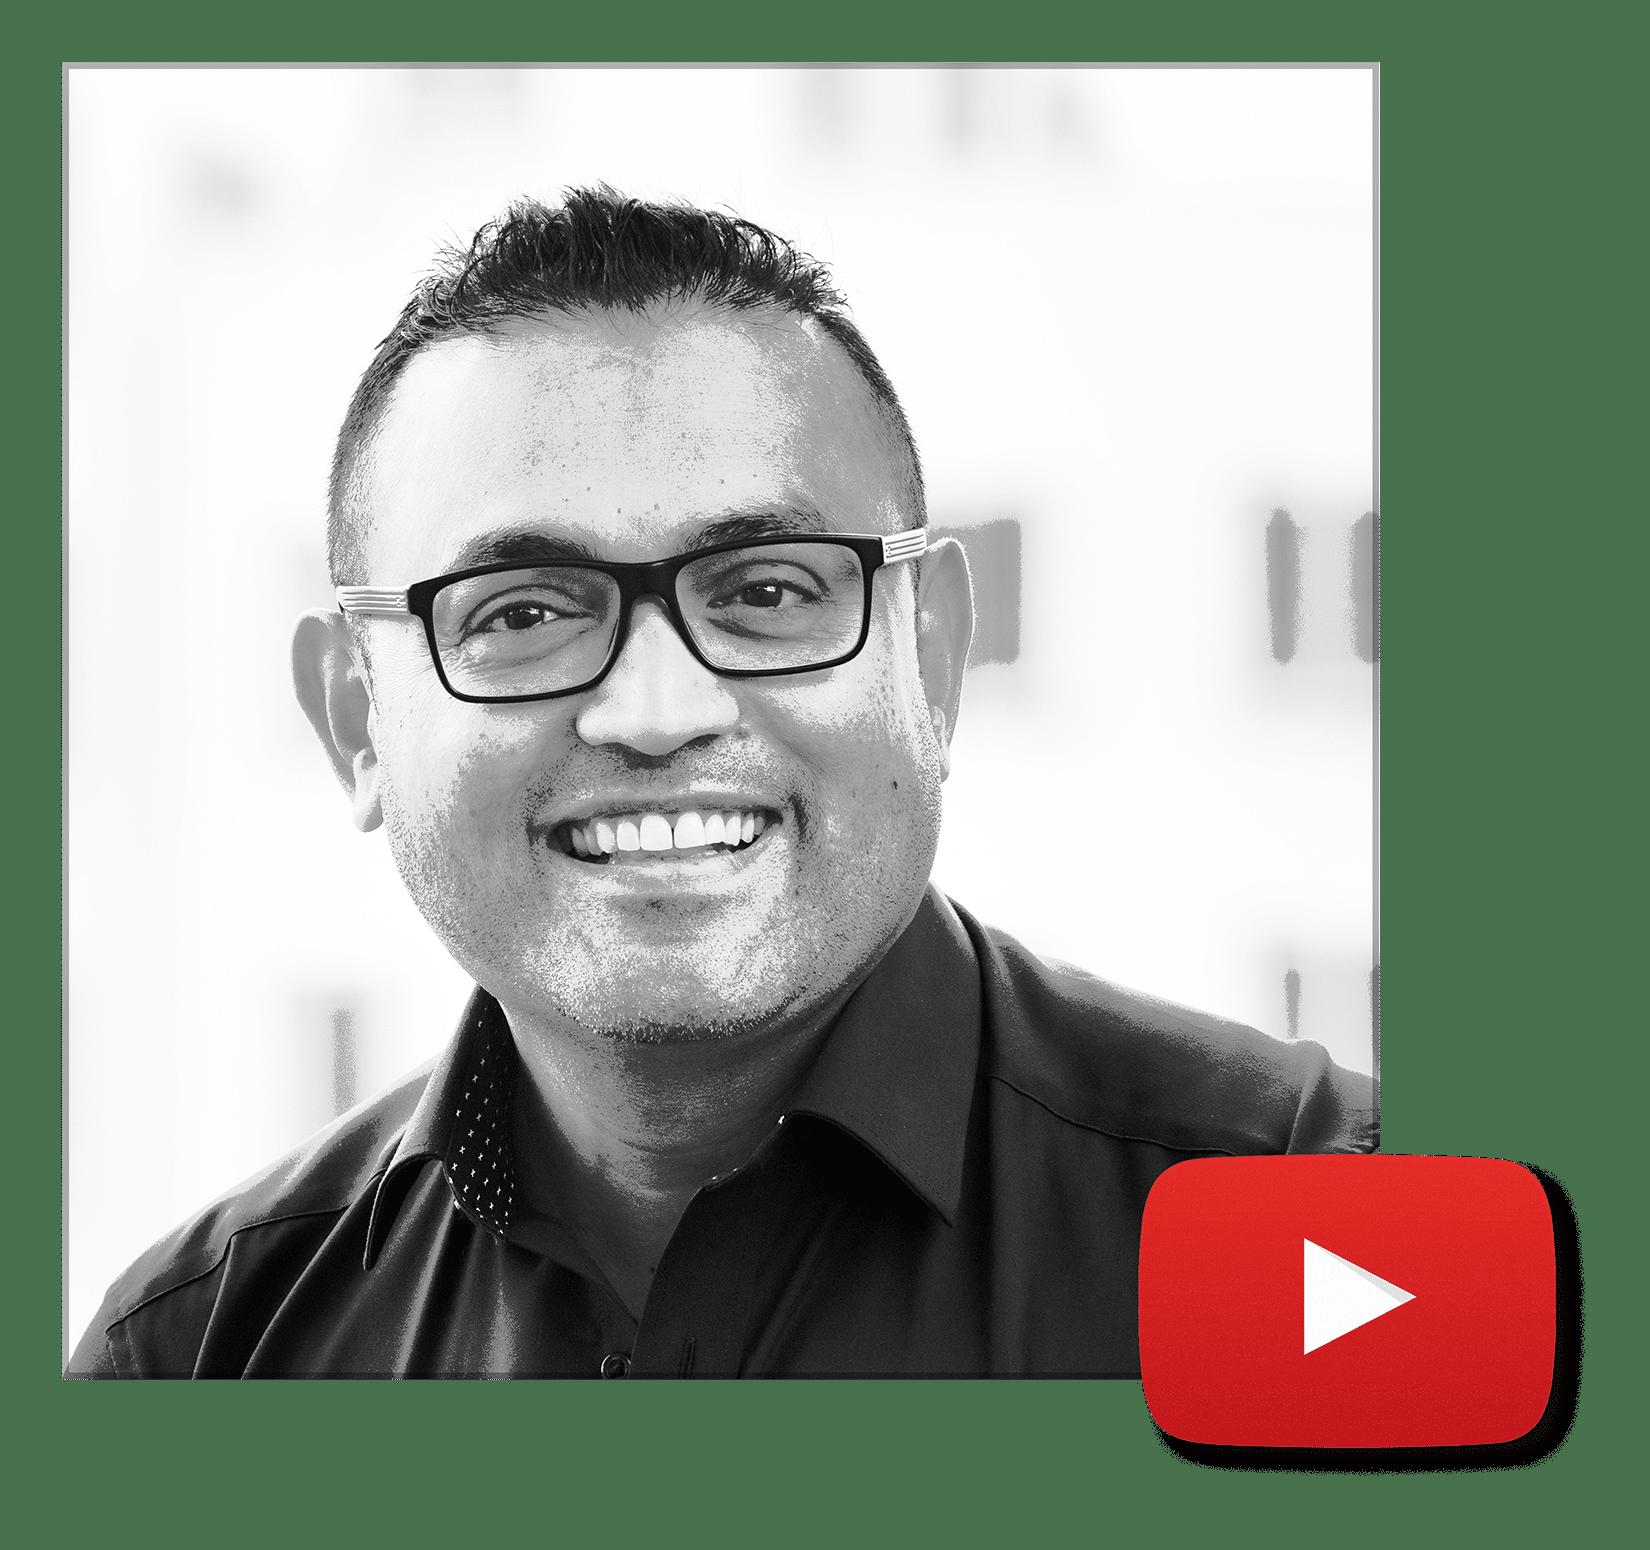 Video Youtube Asim Shahzad Kardiologe Präventivmedizin